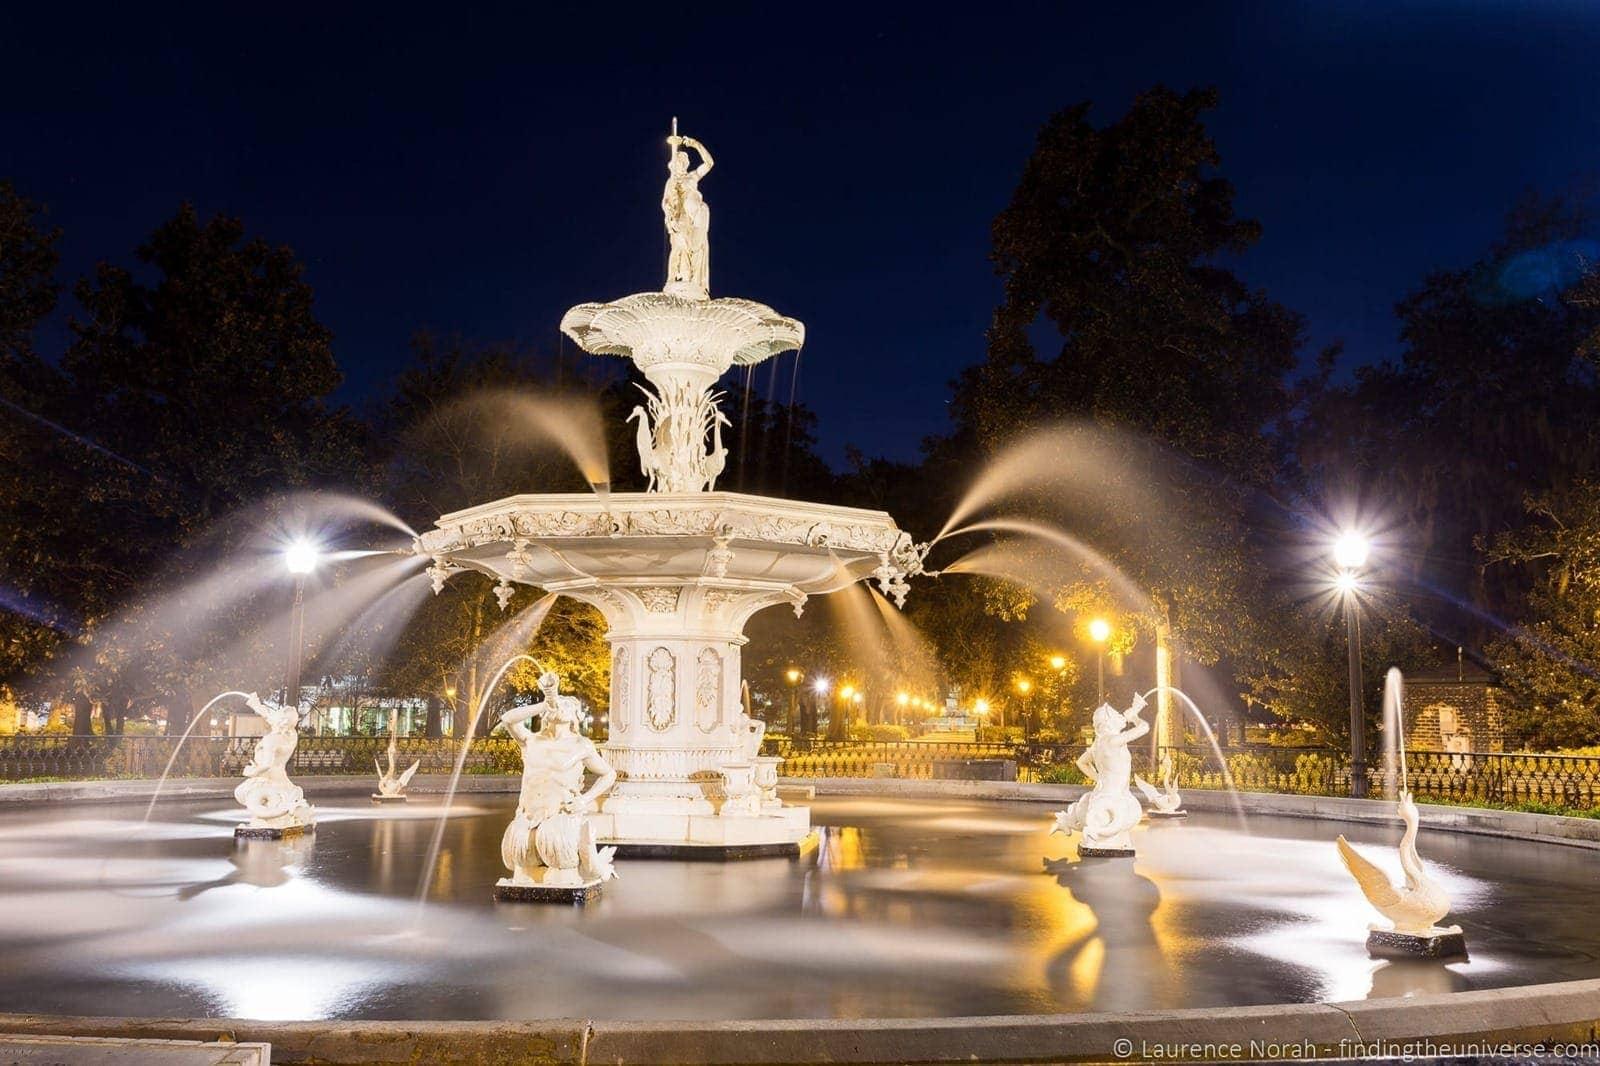 things to do in Savannah: Fountain Forsyth Park Savannah Georgia